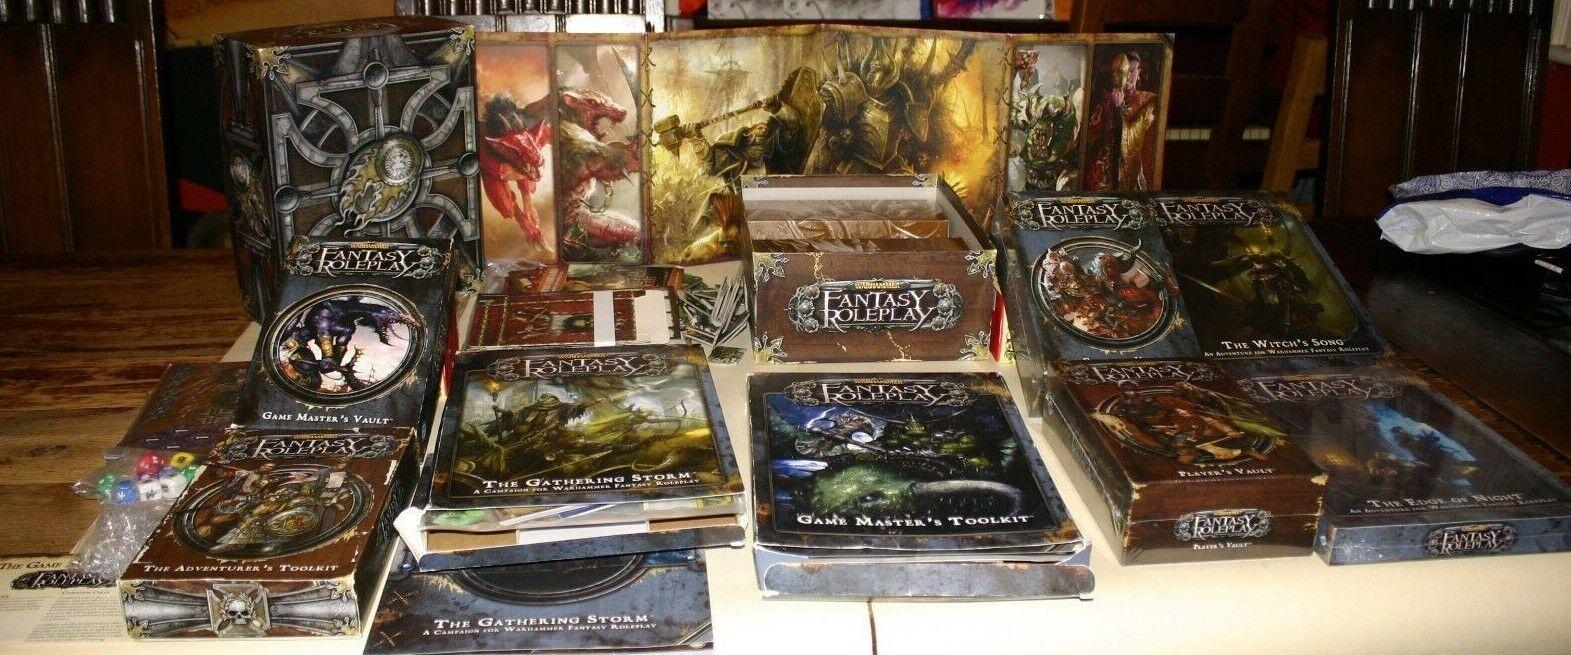 Warhammer Fantasy Role-Playing Game 3rd edition Fantasy Flight Games